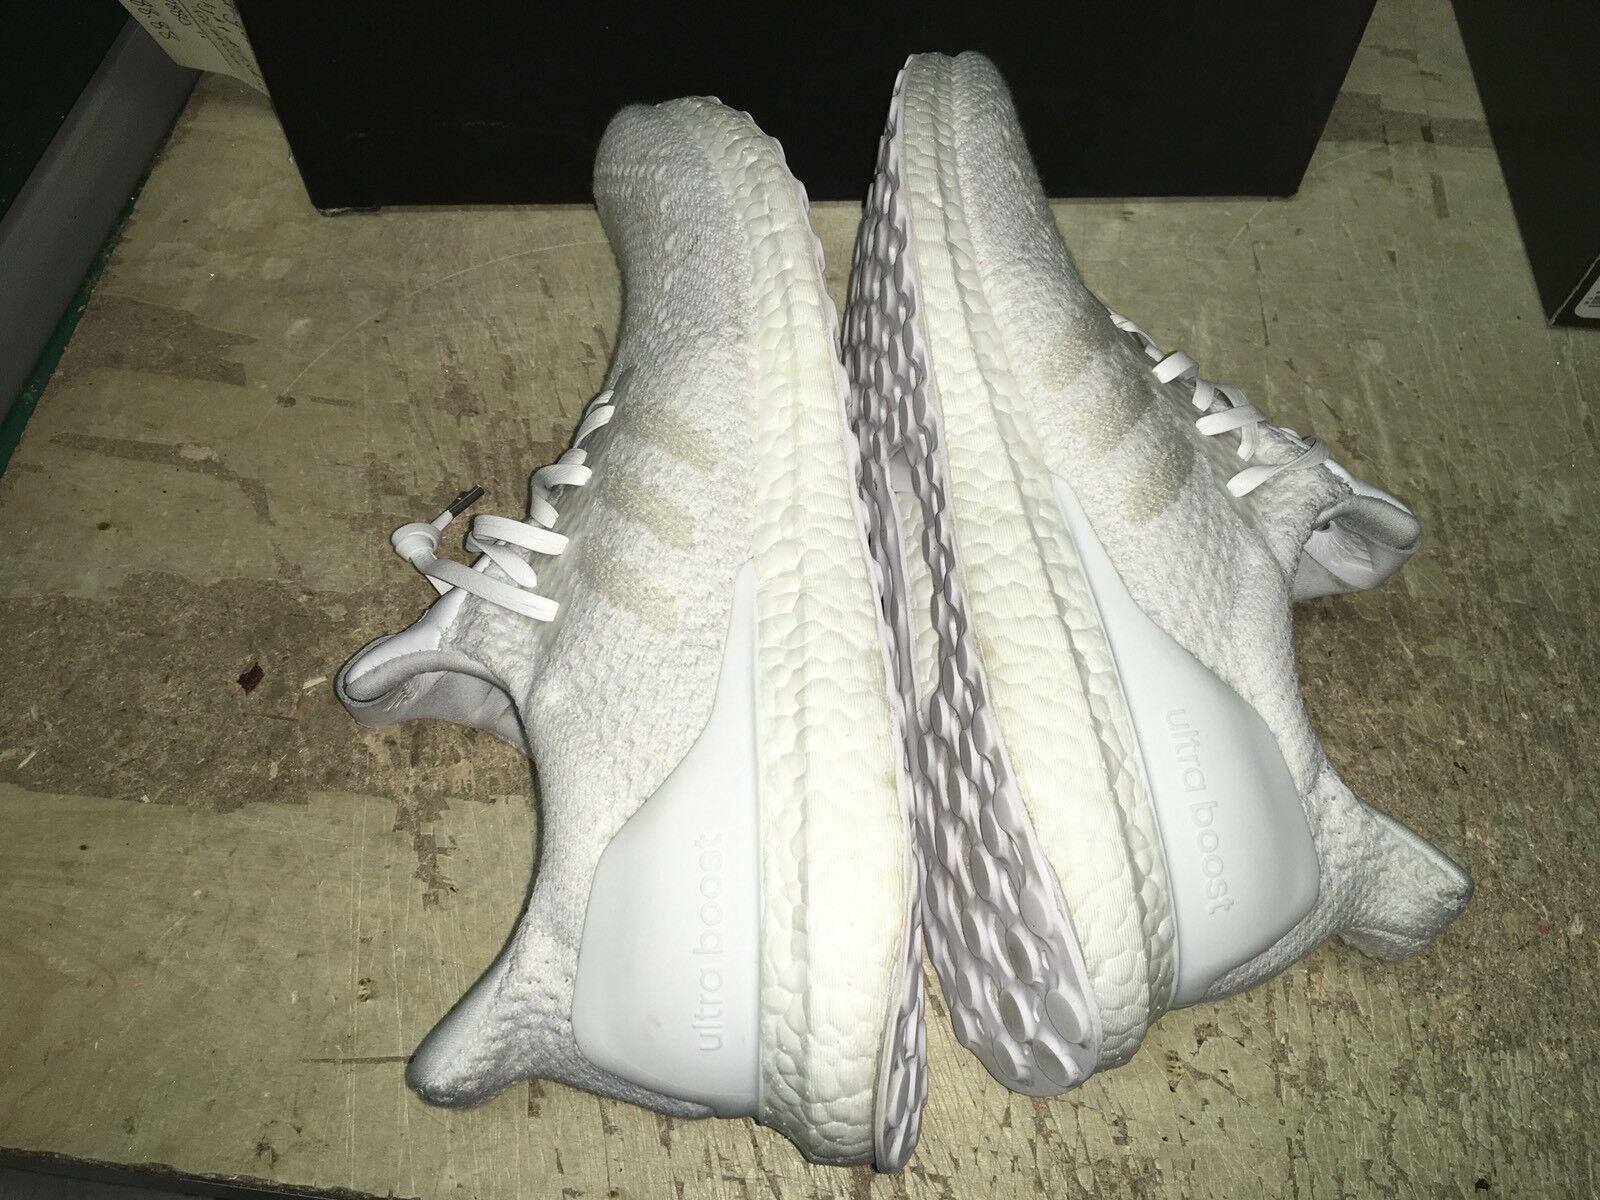 Adidas Adidas Adidas will x verwendet maniere x - konsortium cm7880 ultra ama auftrieb se sz 12 a25c85